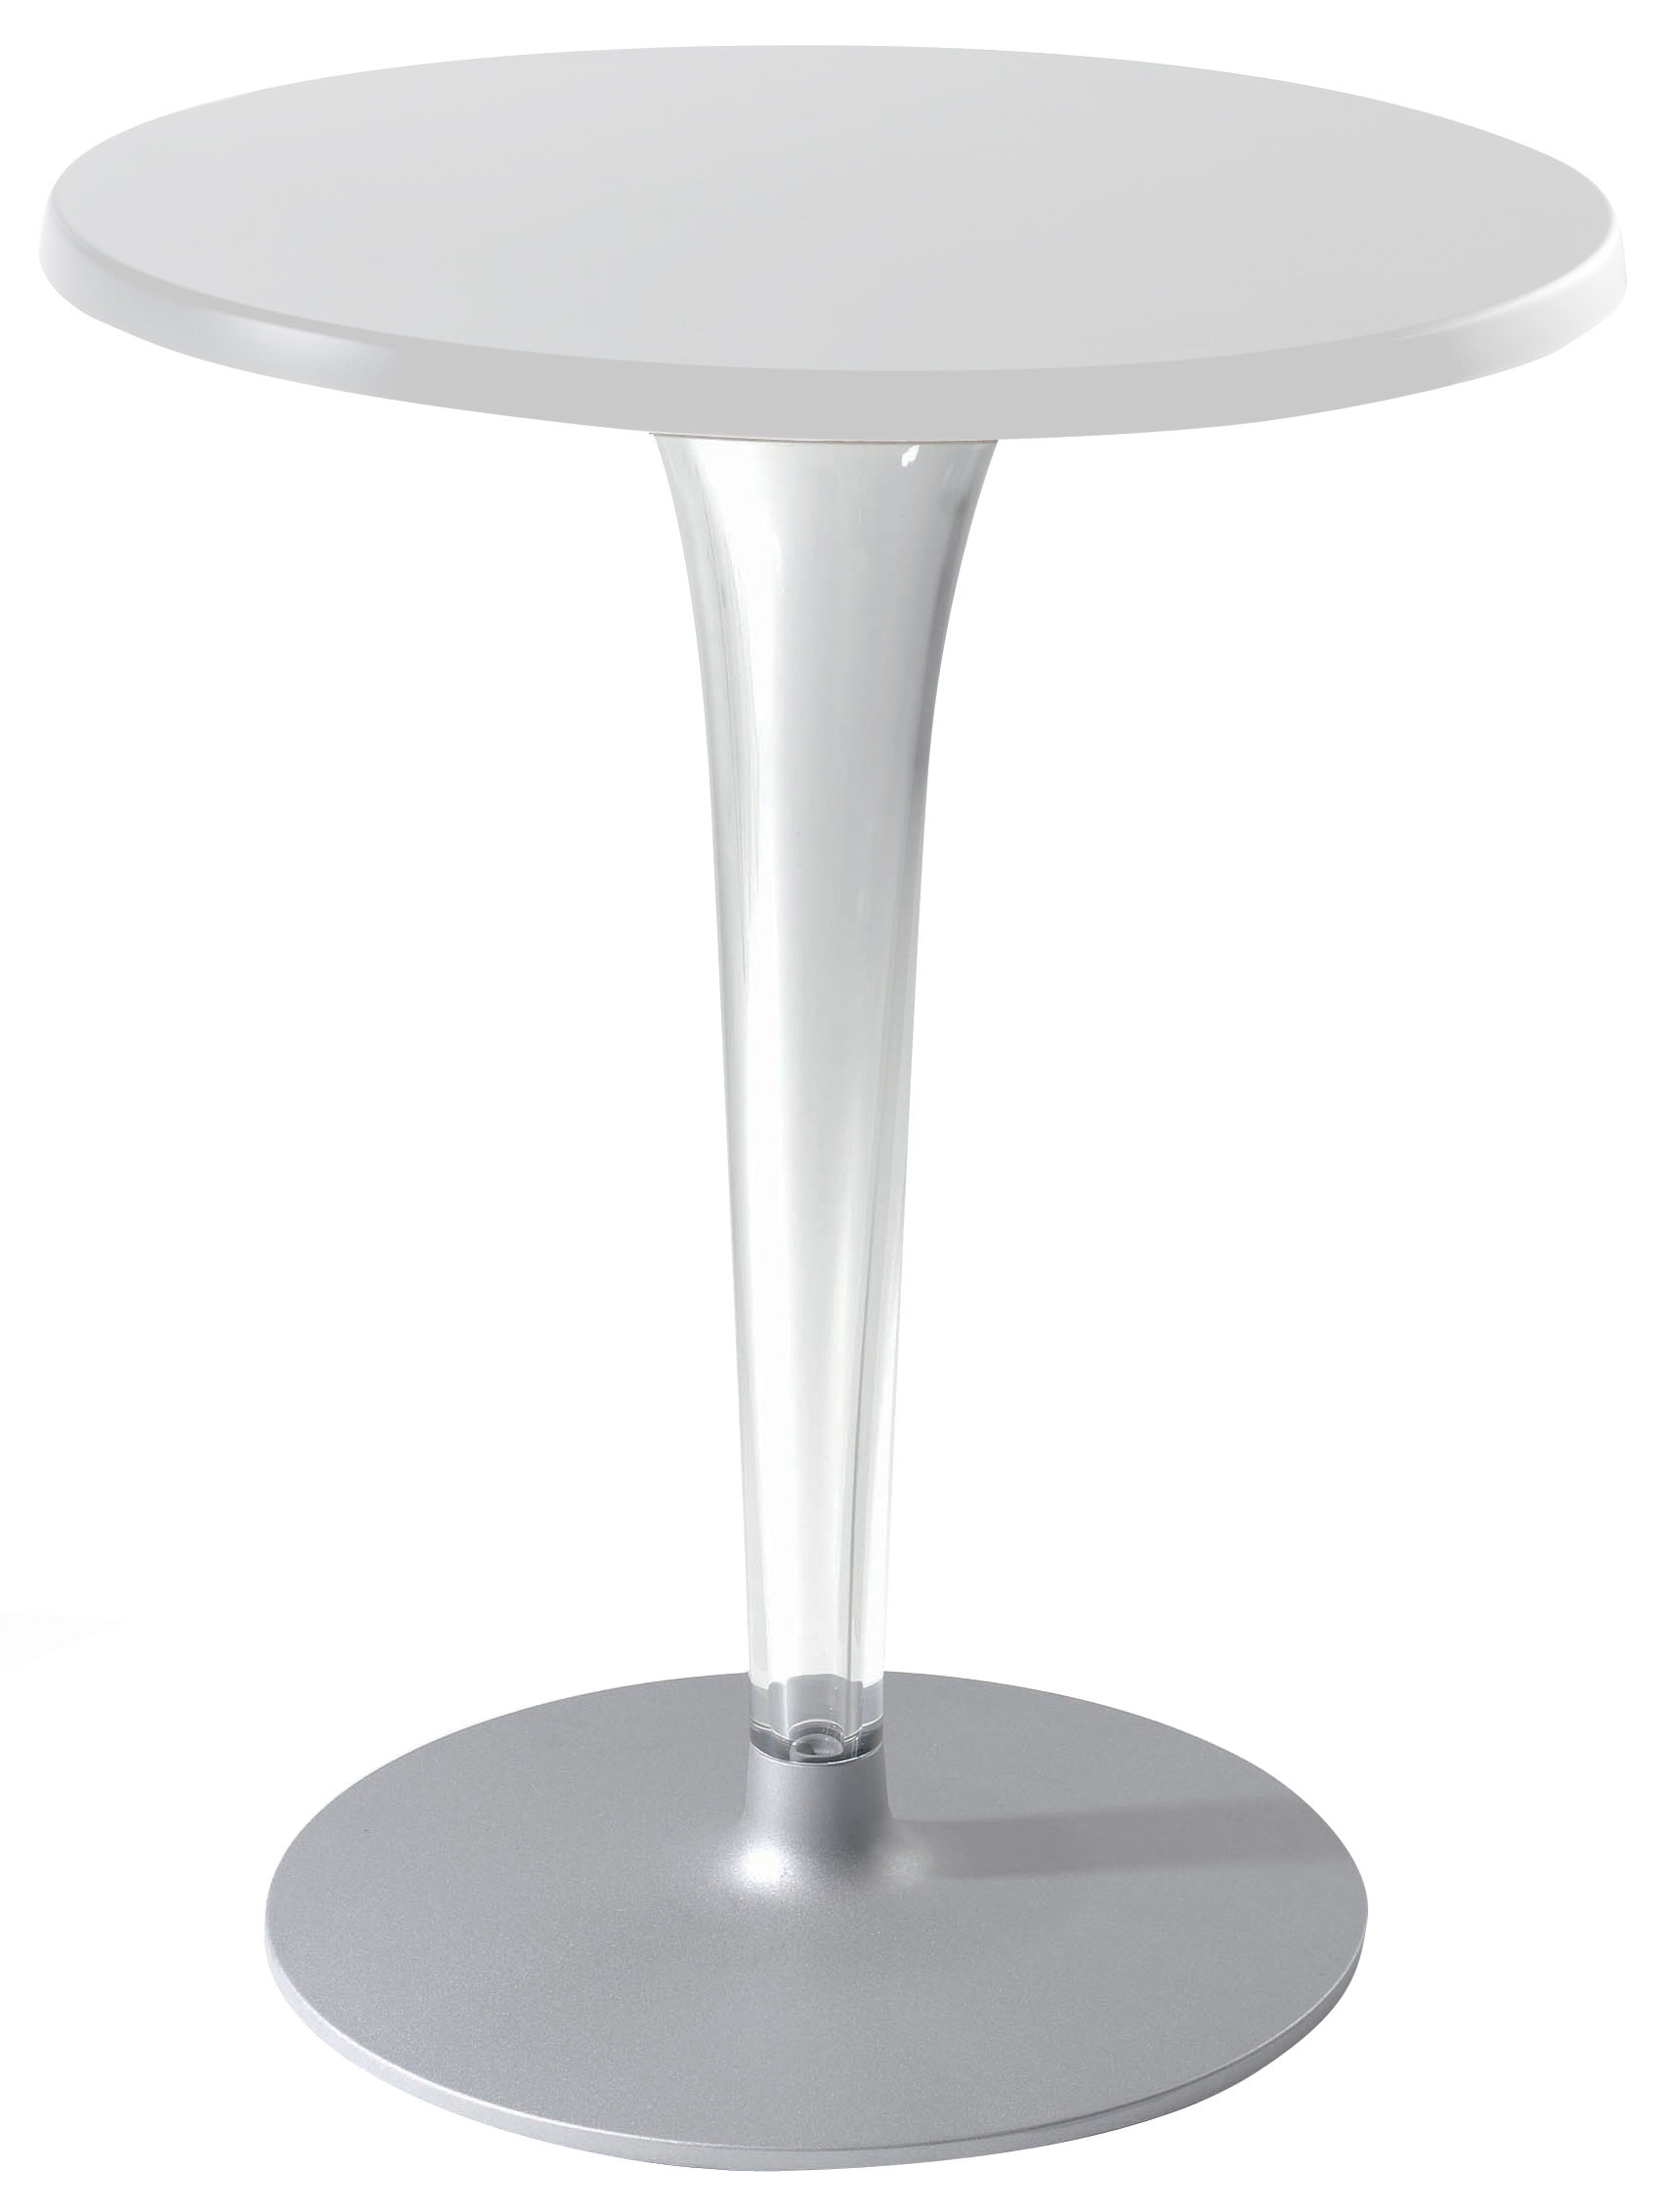 Outdoor - Garden Tables - Top Top - Contract outdoor Garden table - Round table top by Kartell - White/ round leg - Melamine, PMMA, Varnished aluminium